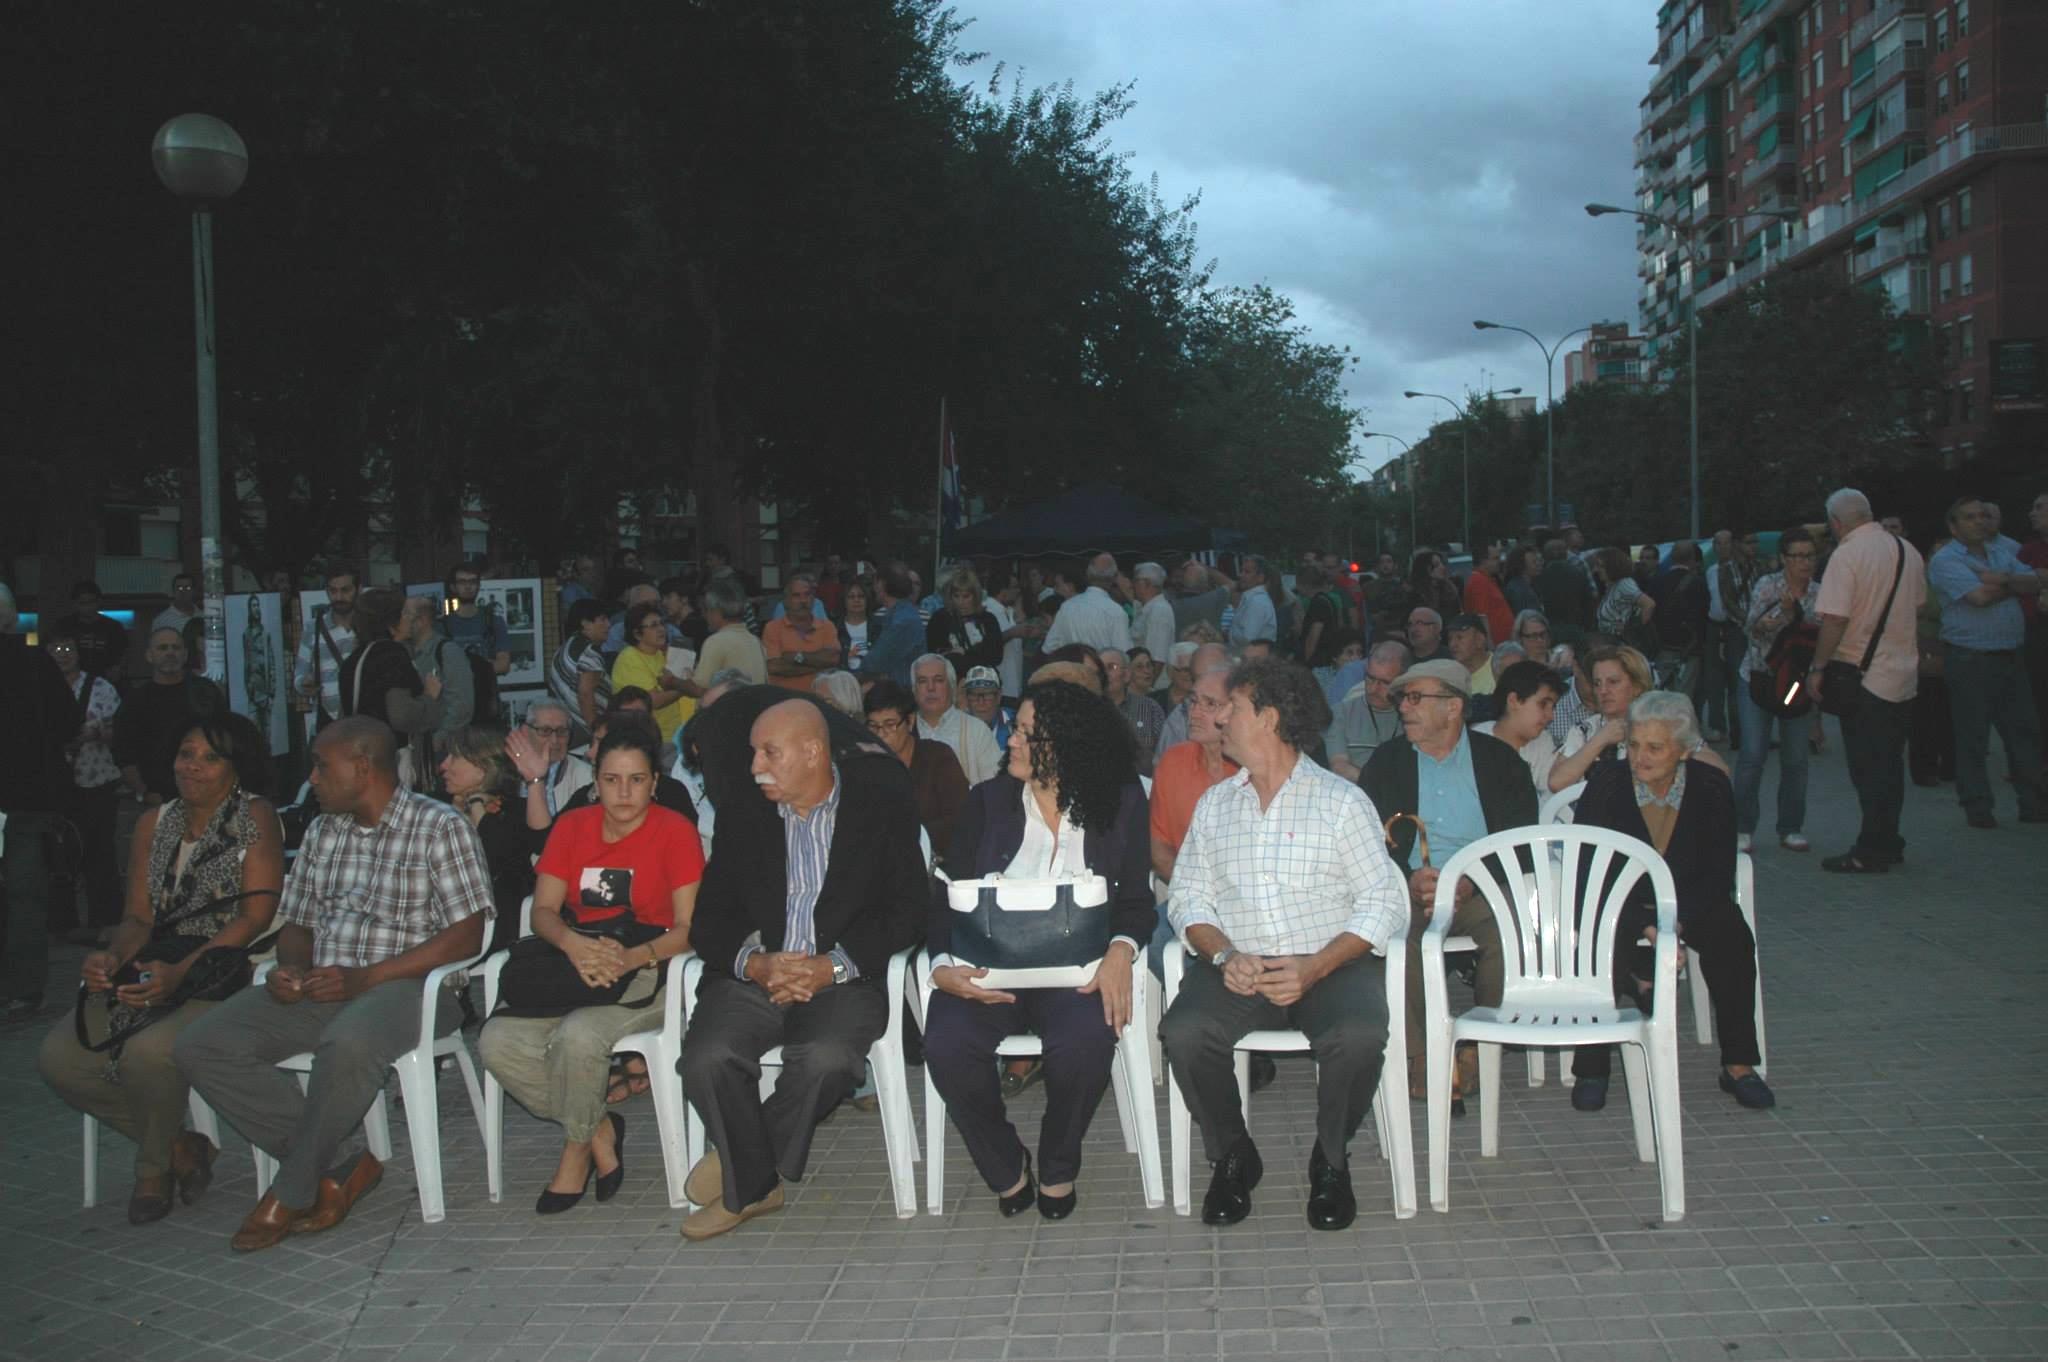 Acte en Homenatge al Che Guevara a Badalona el 8 de octubre de 2013